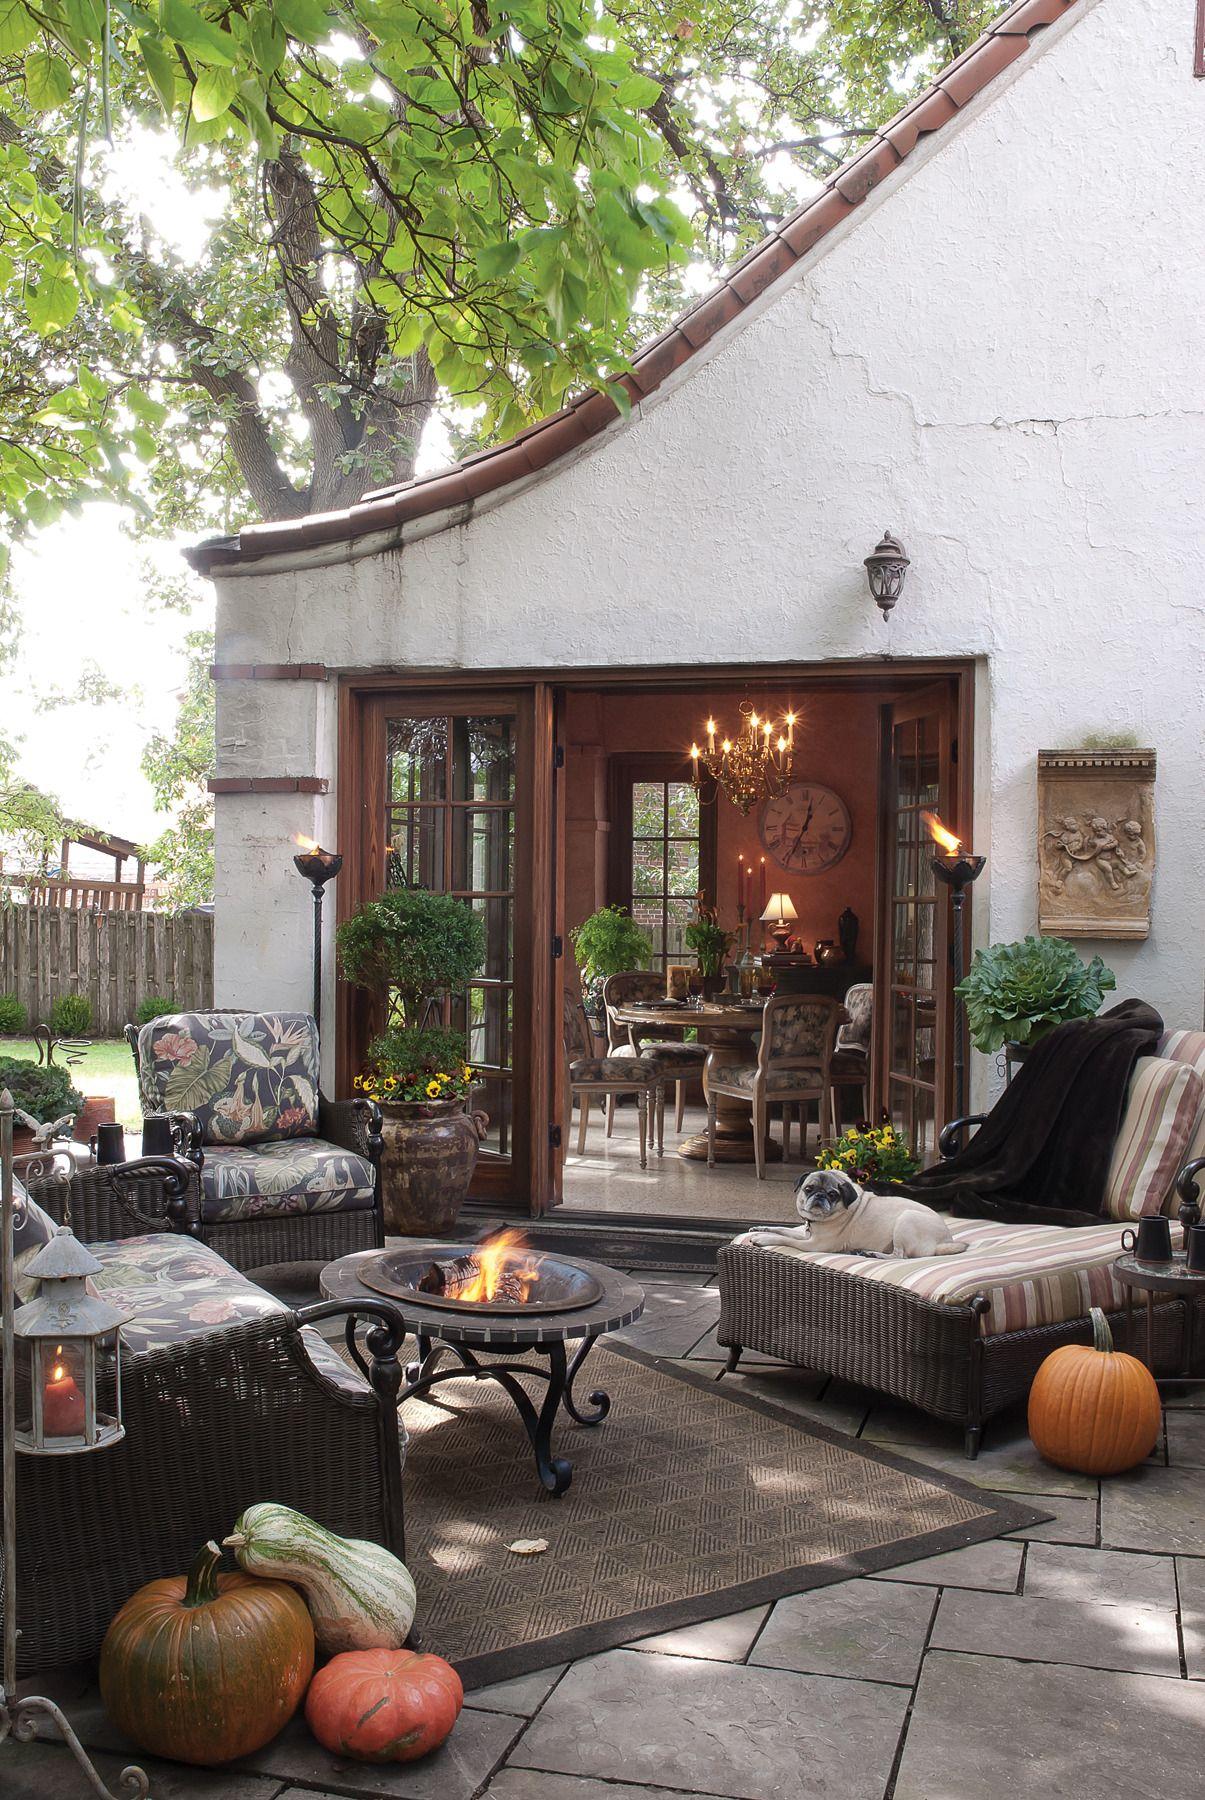 halloween monster pumpkinseason a little autumn deco on classy backyard design ideas may be you never think id=49318